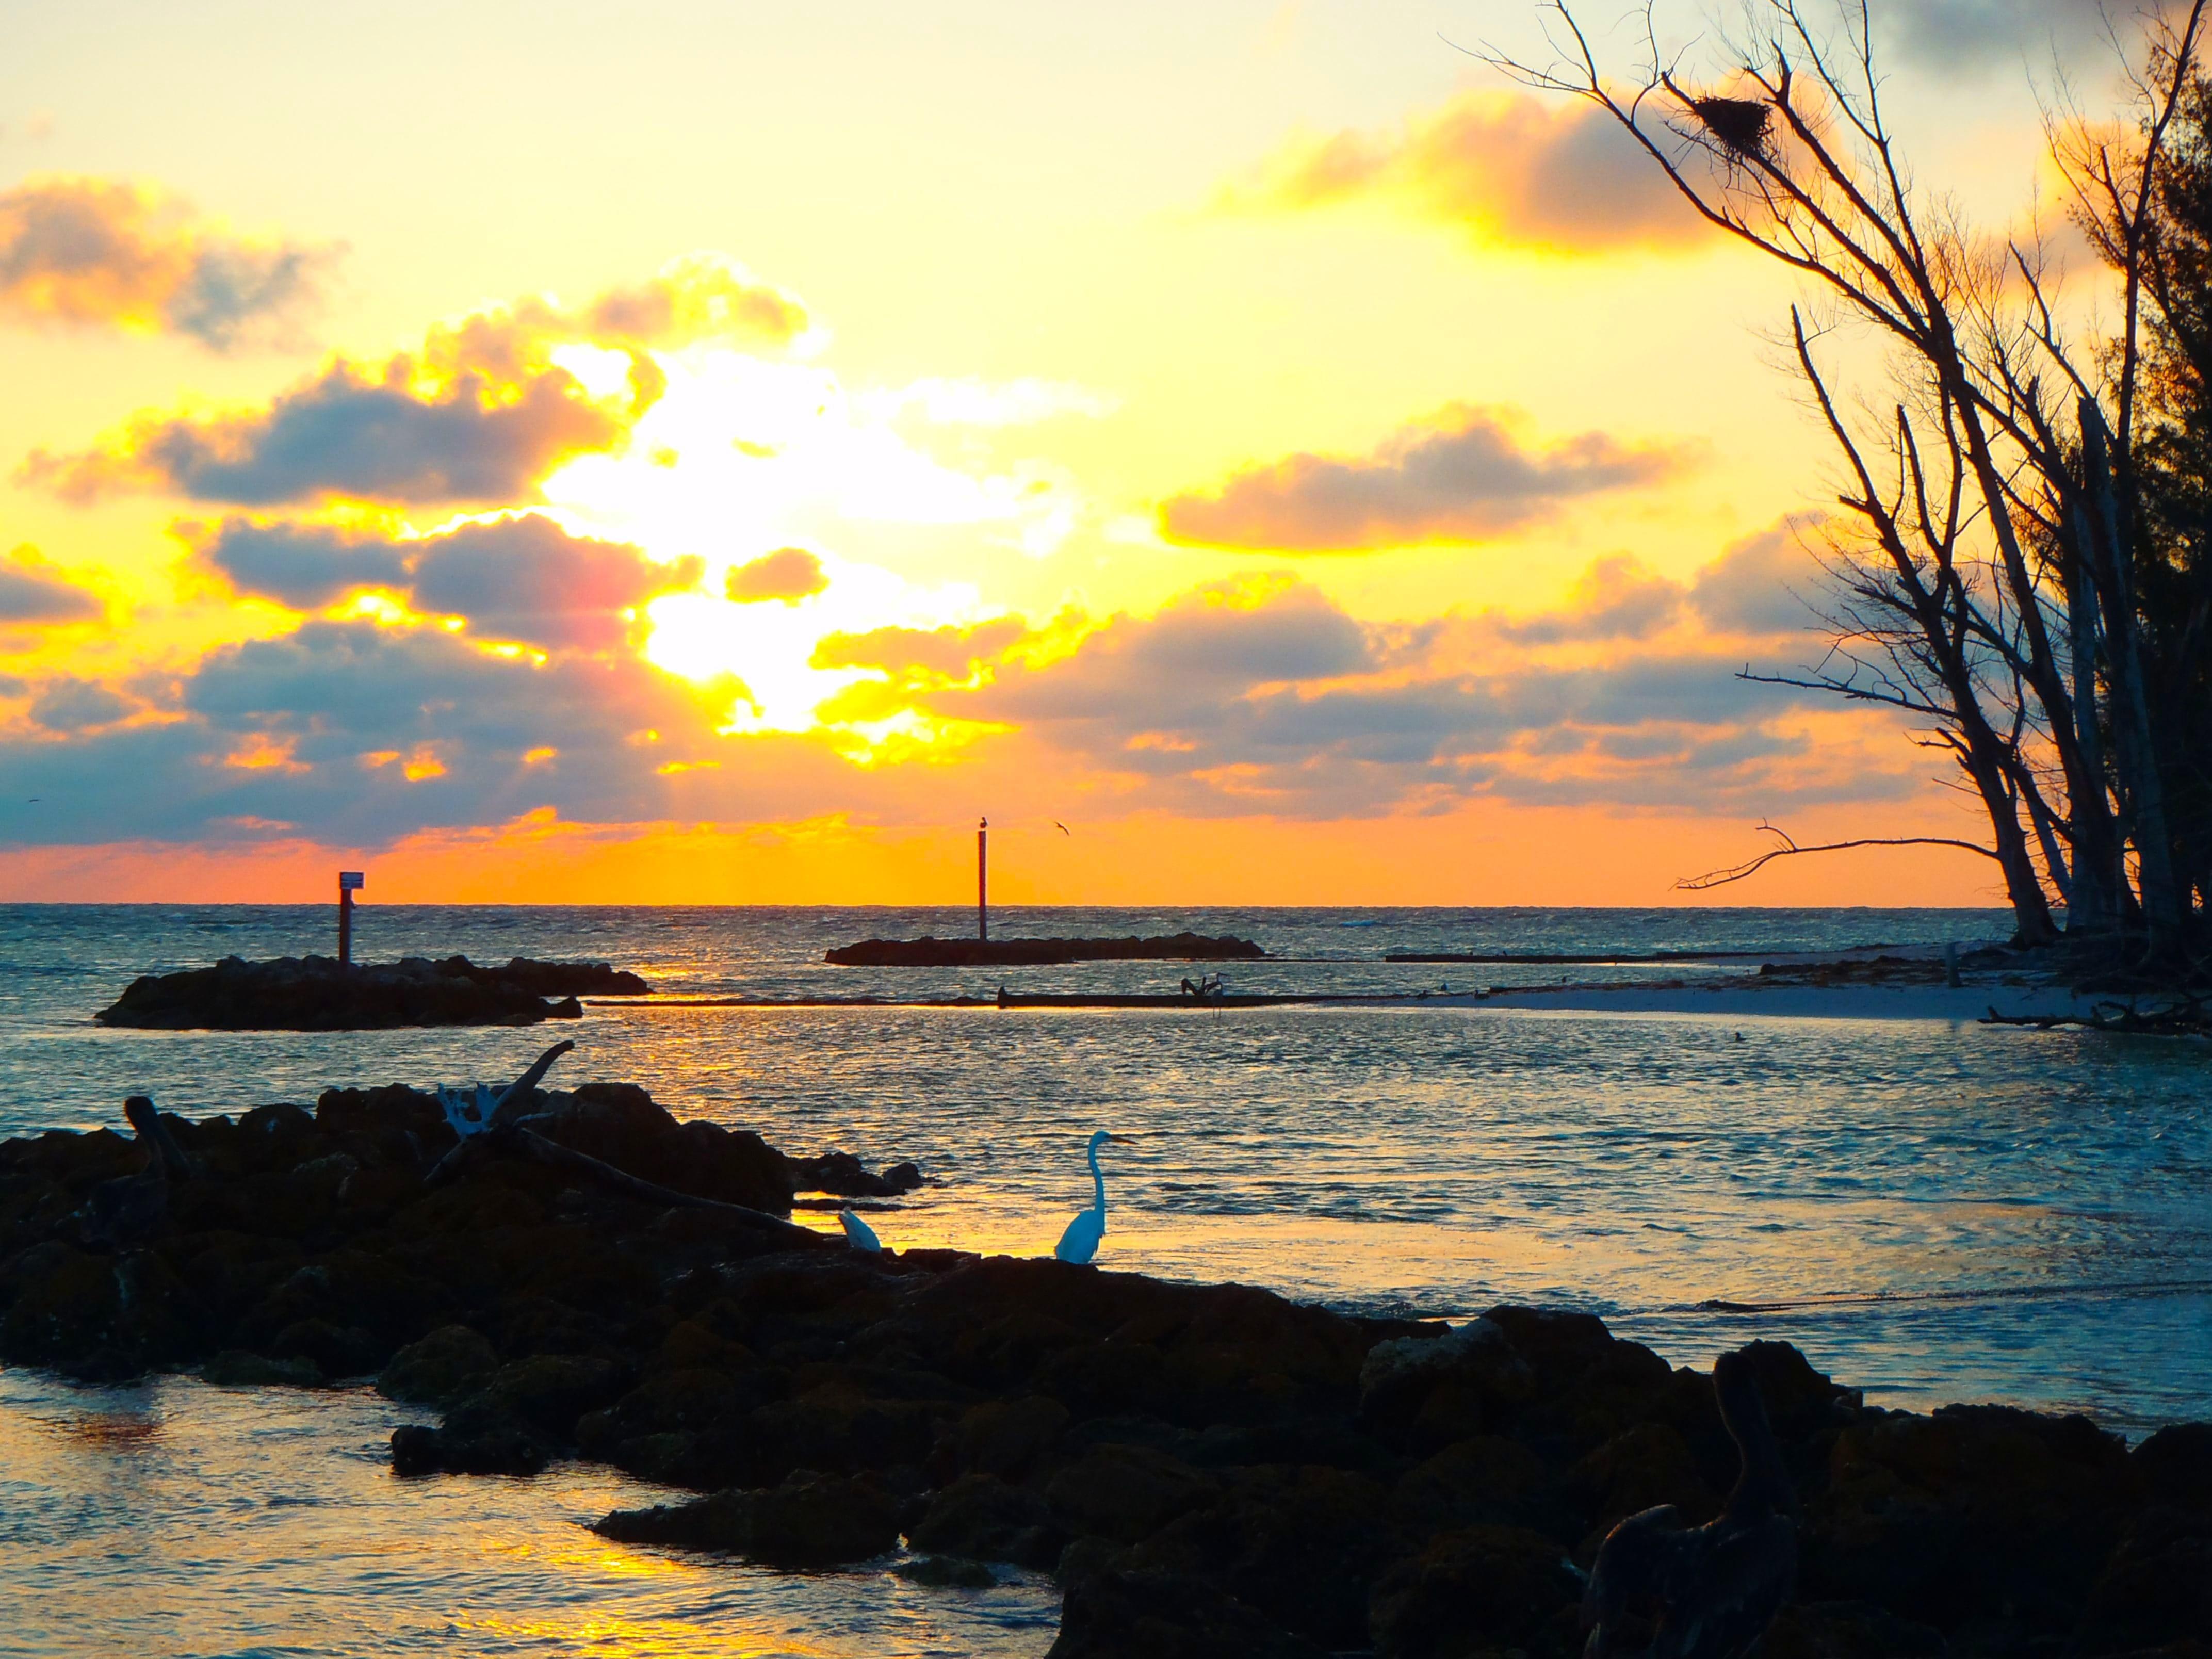 Sanibel captiva fishing charters sunrise for Captiva fishing charters